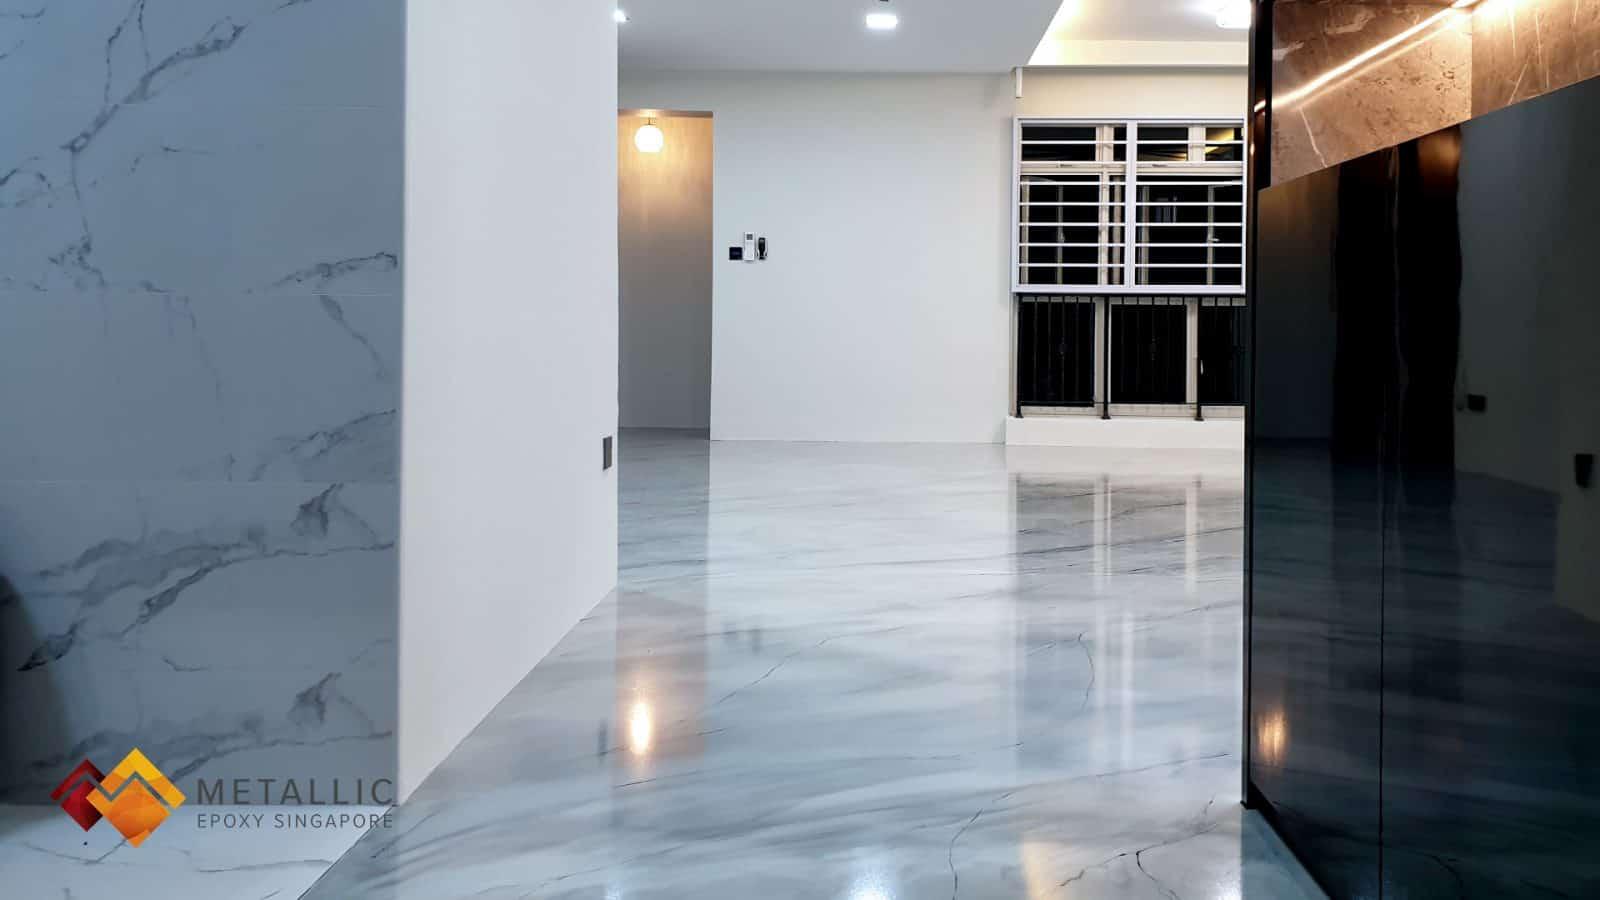 metallic epoxy singapore grey marble living room floor